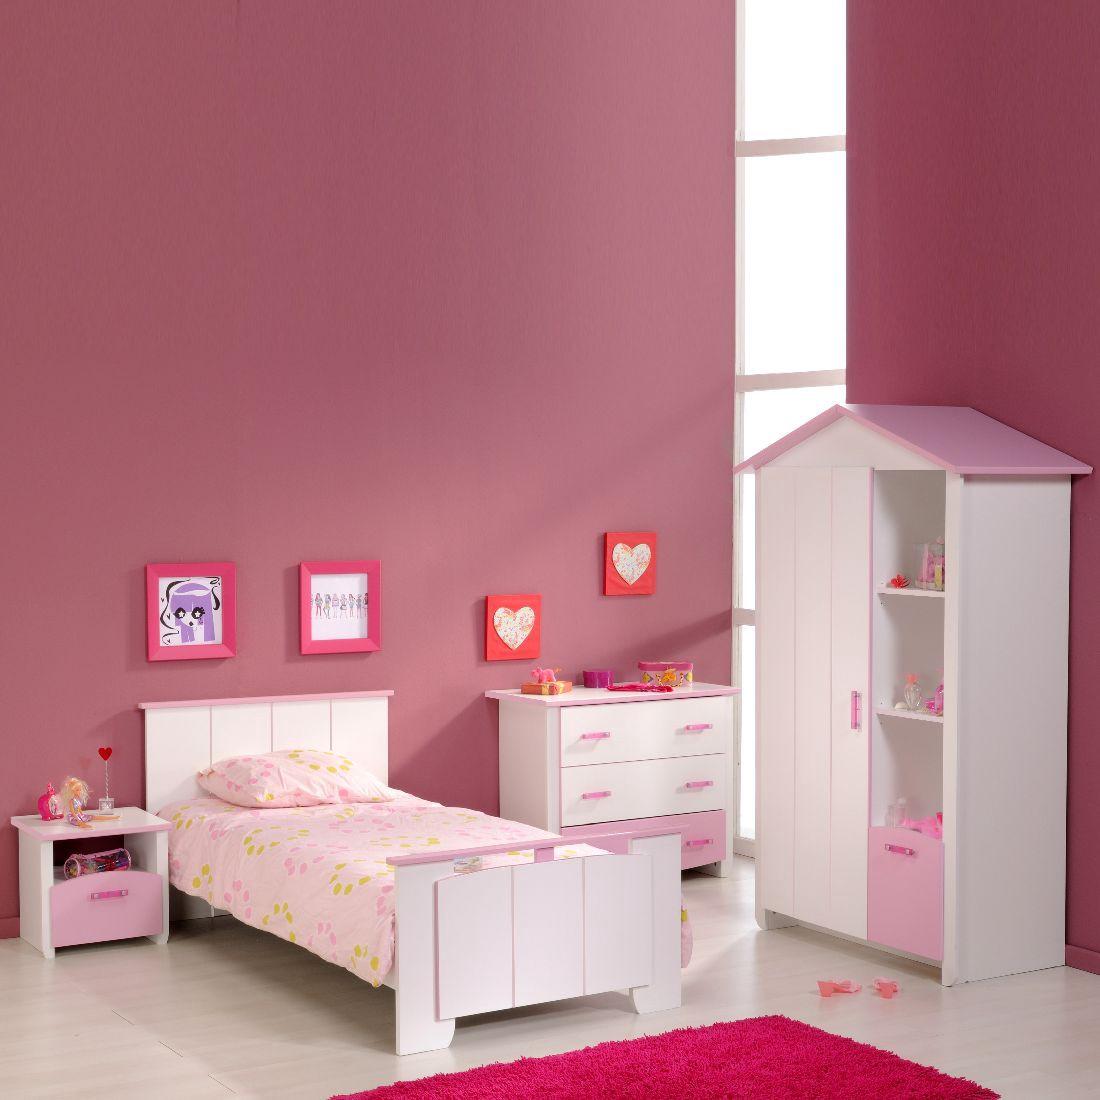 sparset biotiful 4 teilig bett. Black Bedroom Furniture Sets. Home Design Ideas